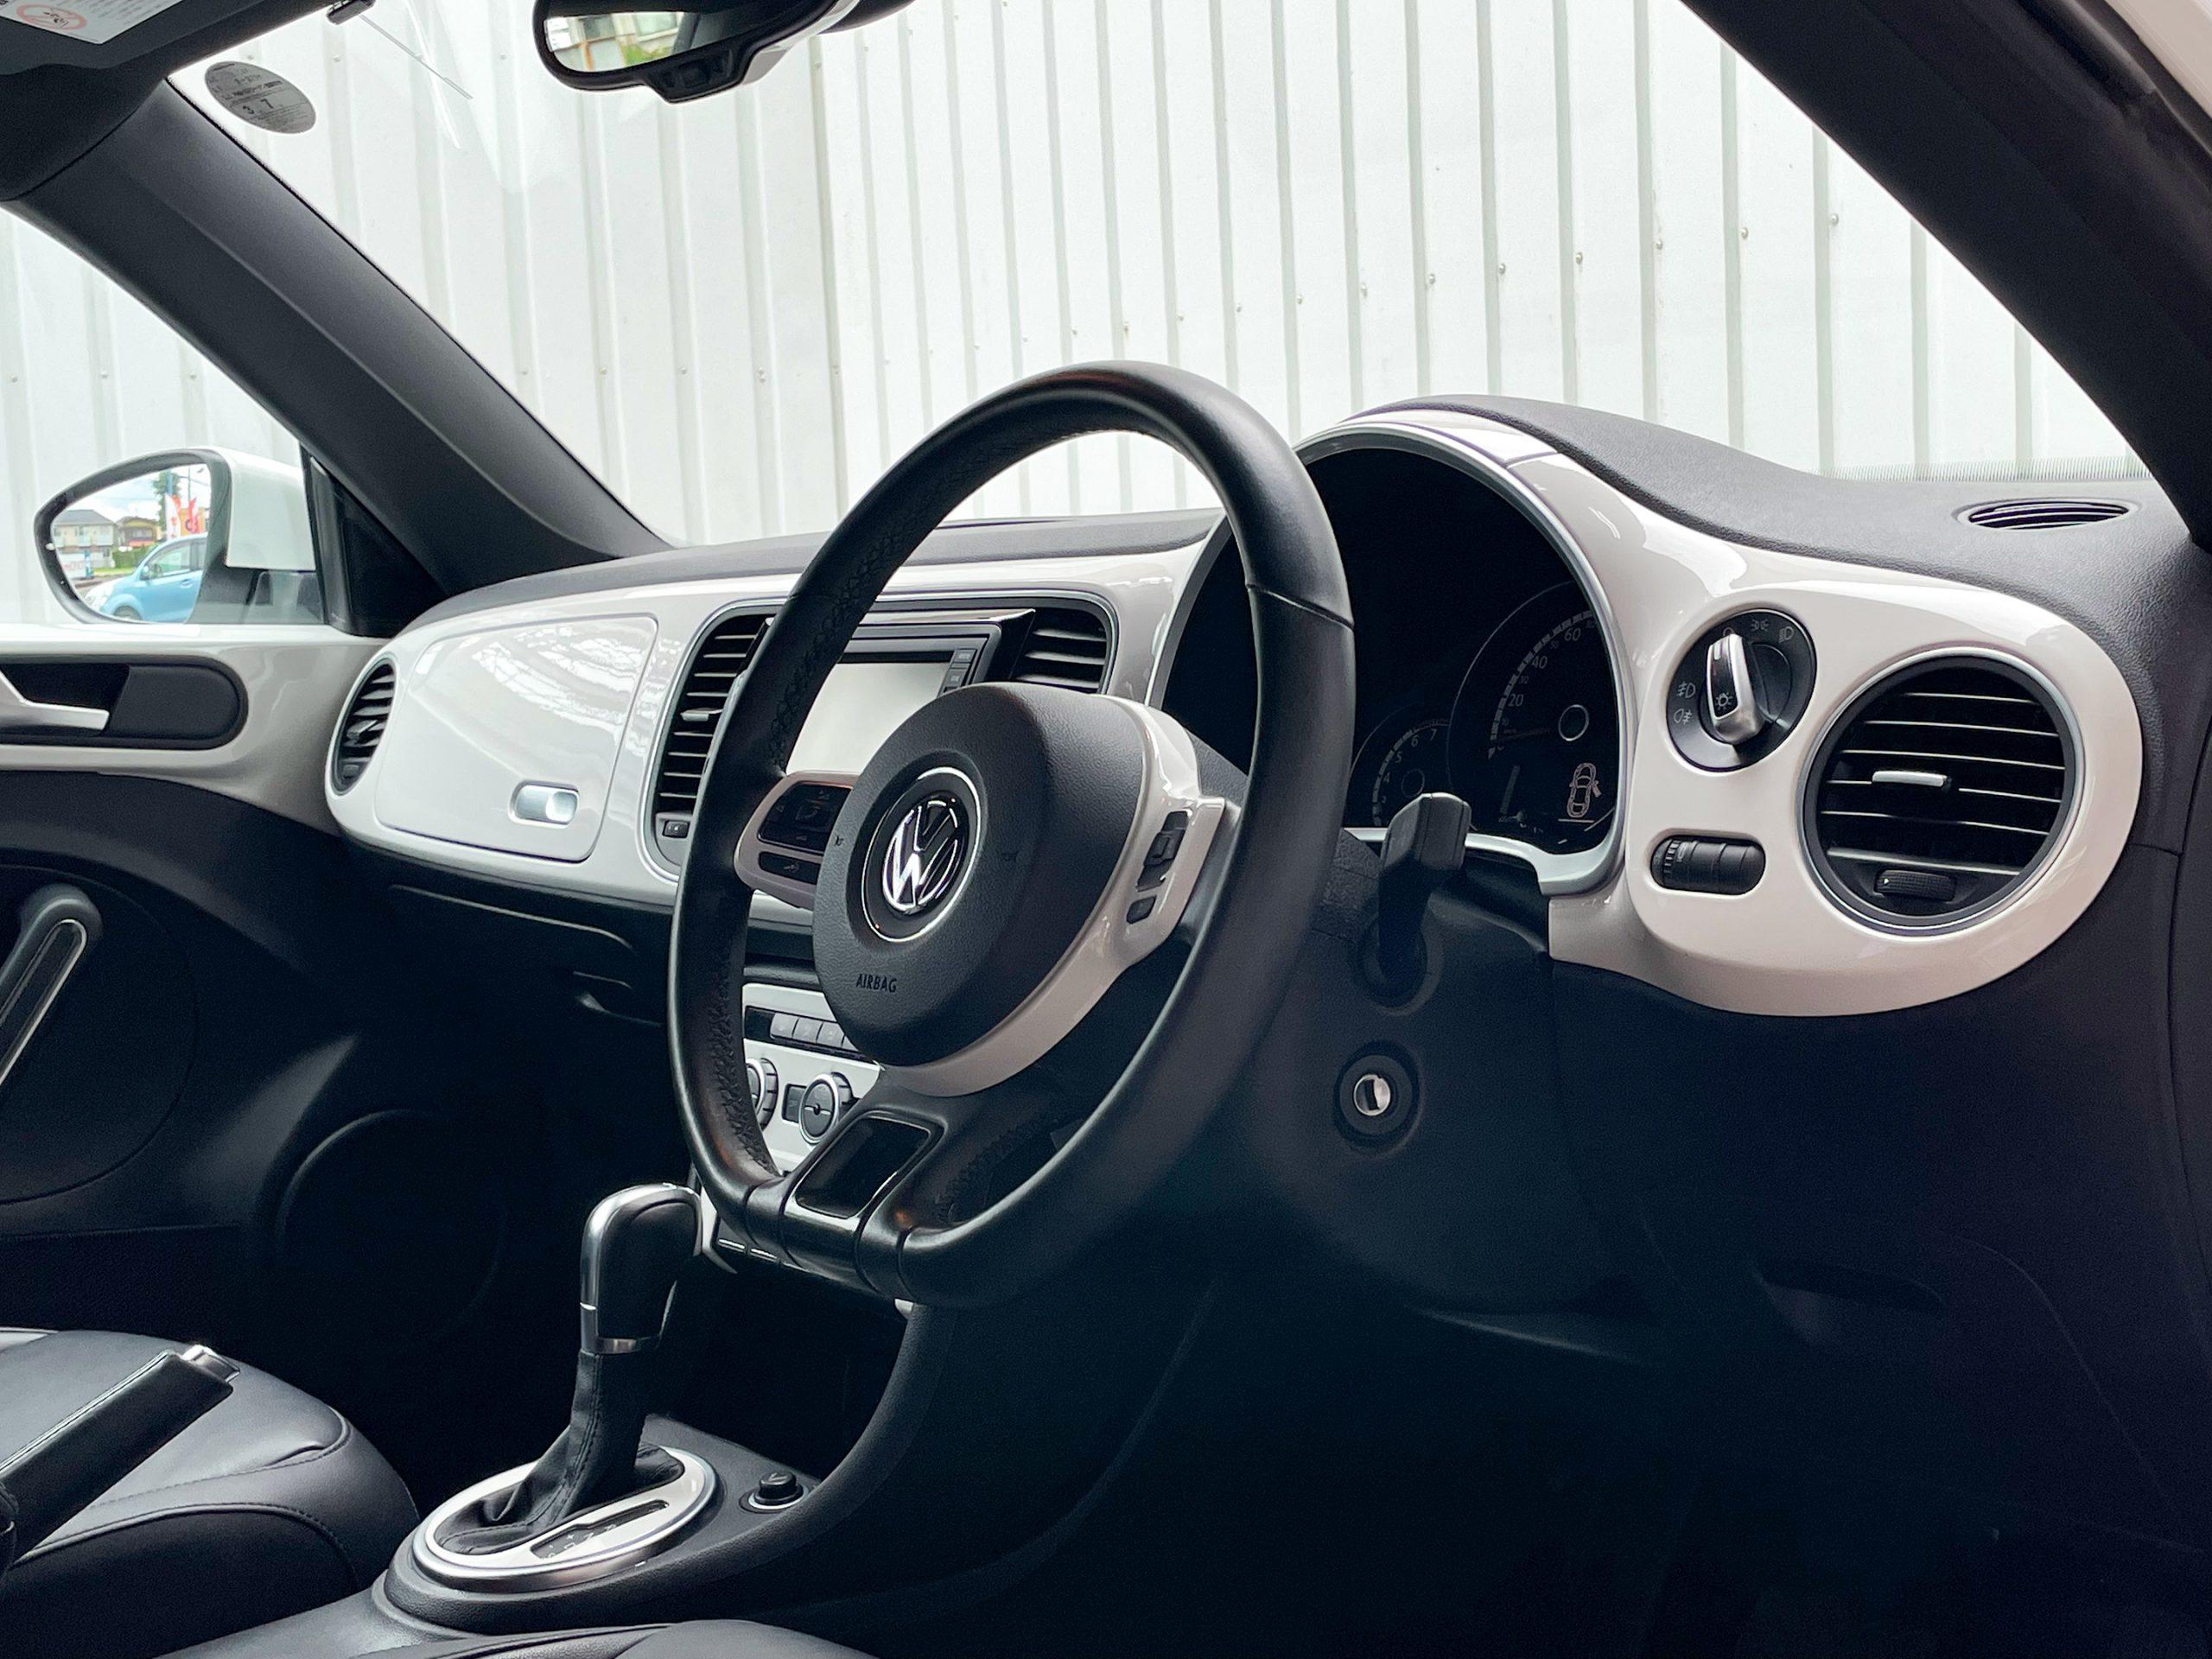 VW The Beetle デザインレザーパッケージ